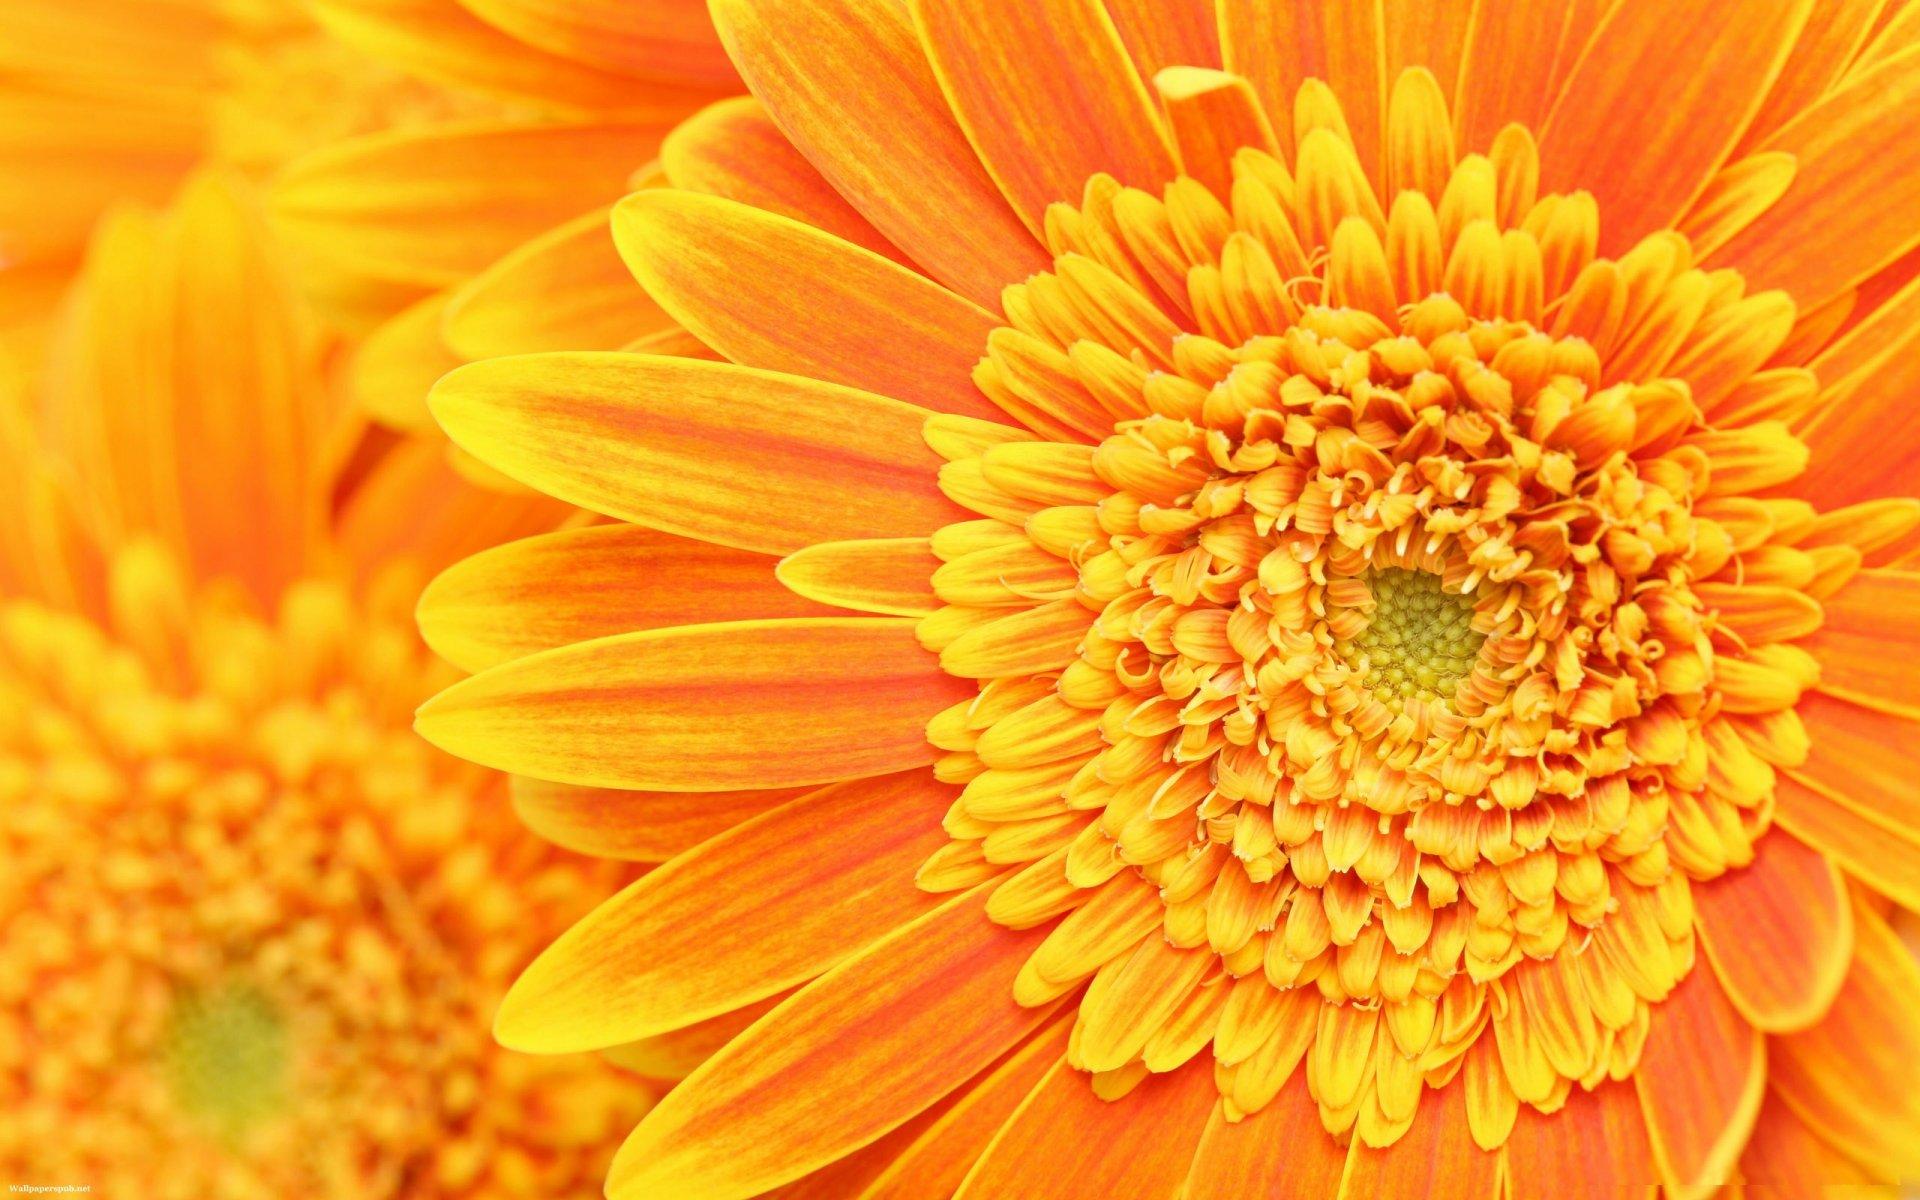 Картинки цветы на оранжевом фоне